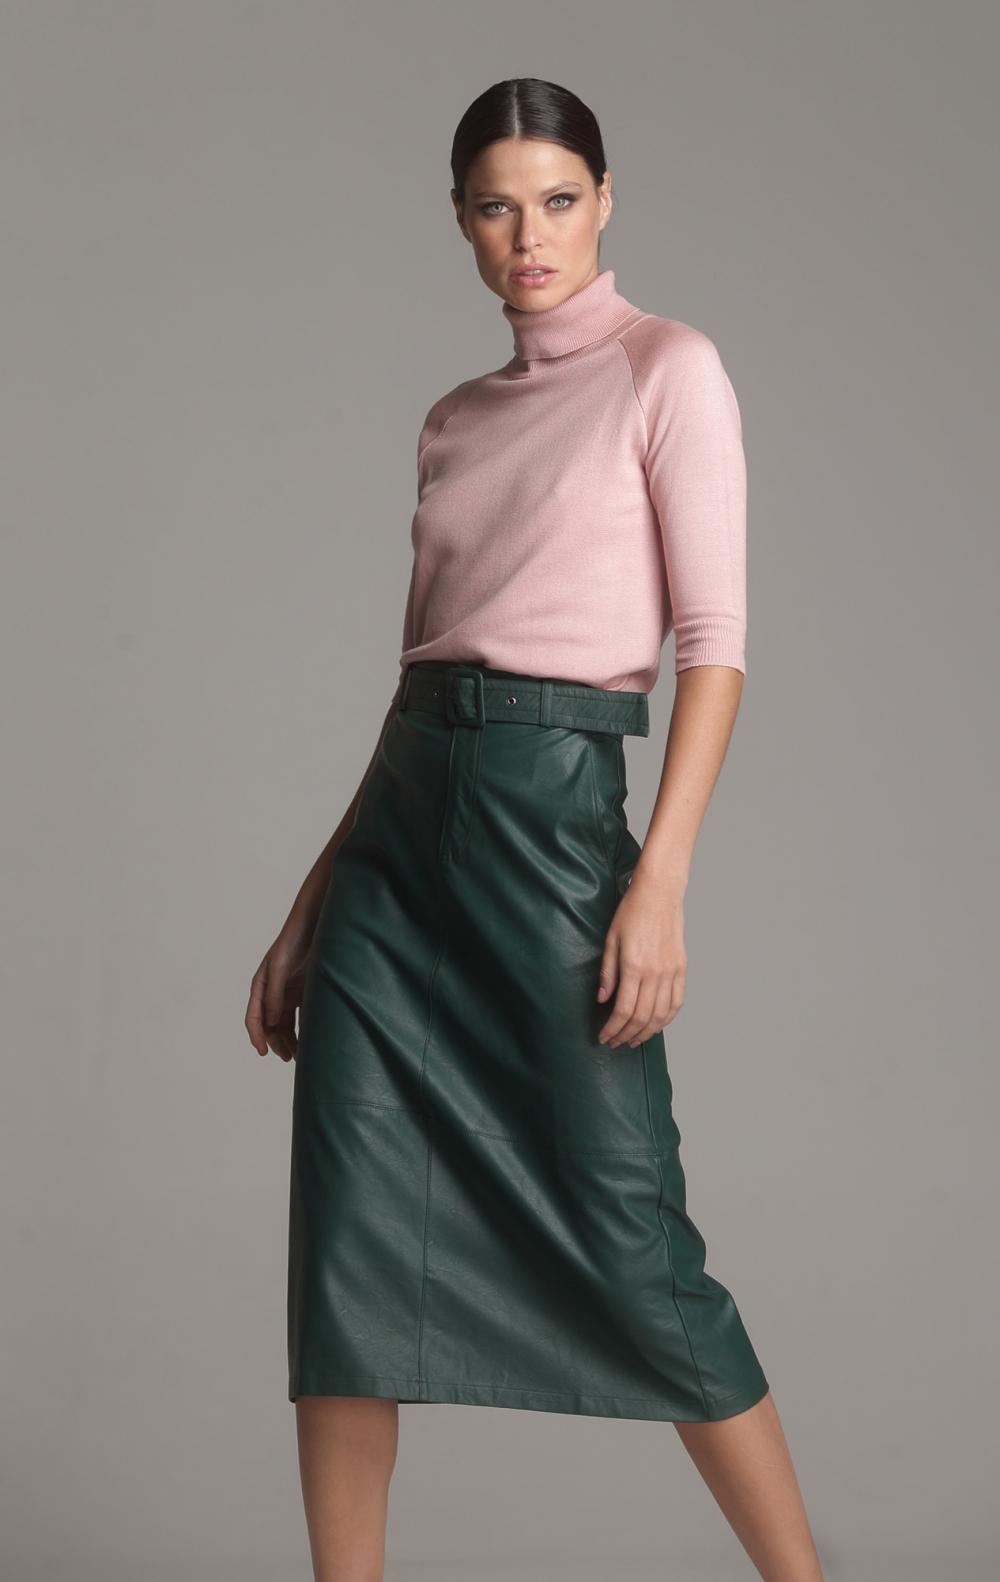 Blusa Tricot Gola Rosa  - Foto 3